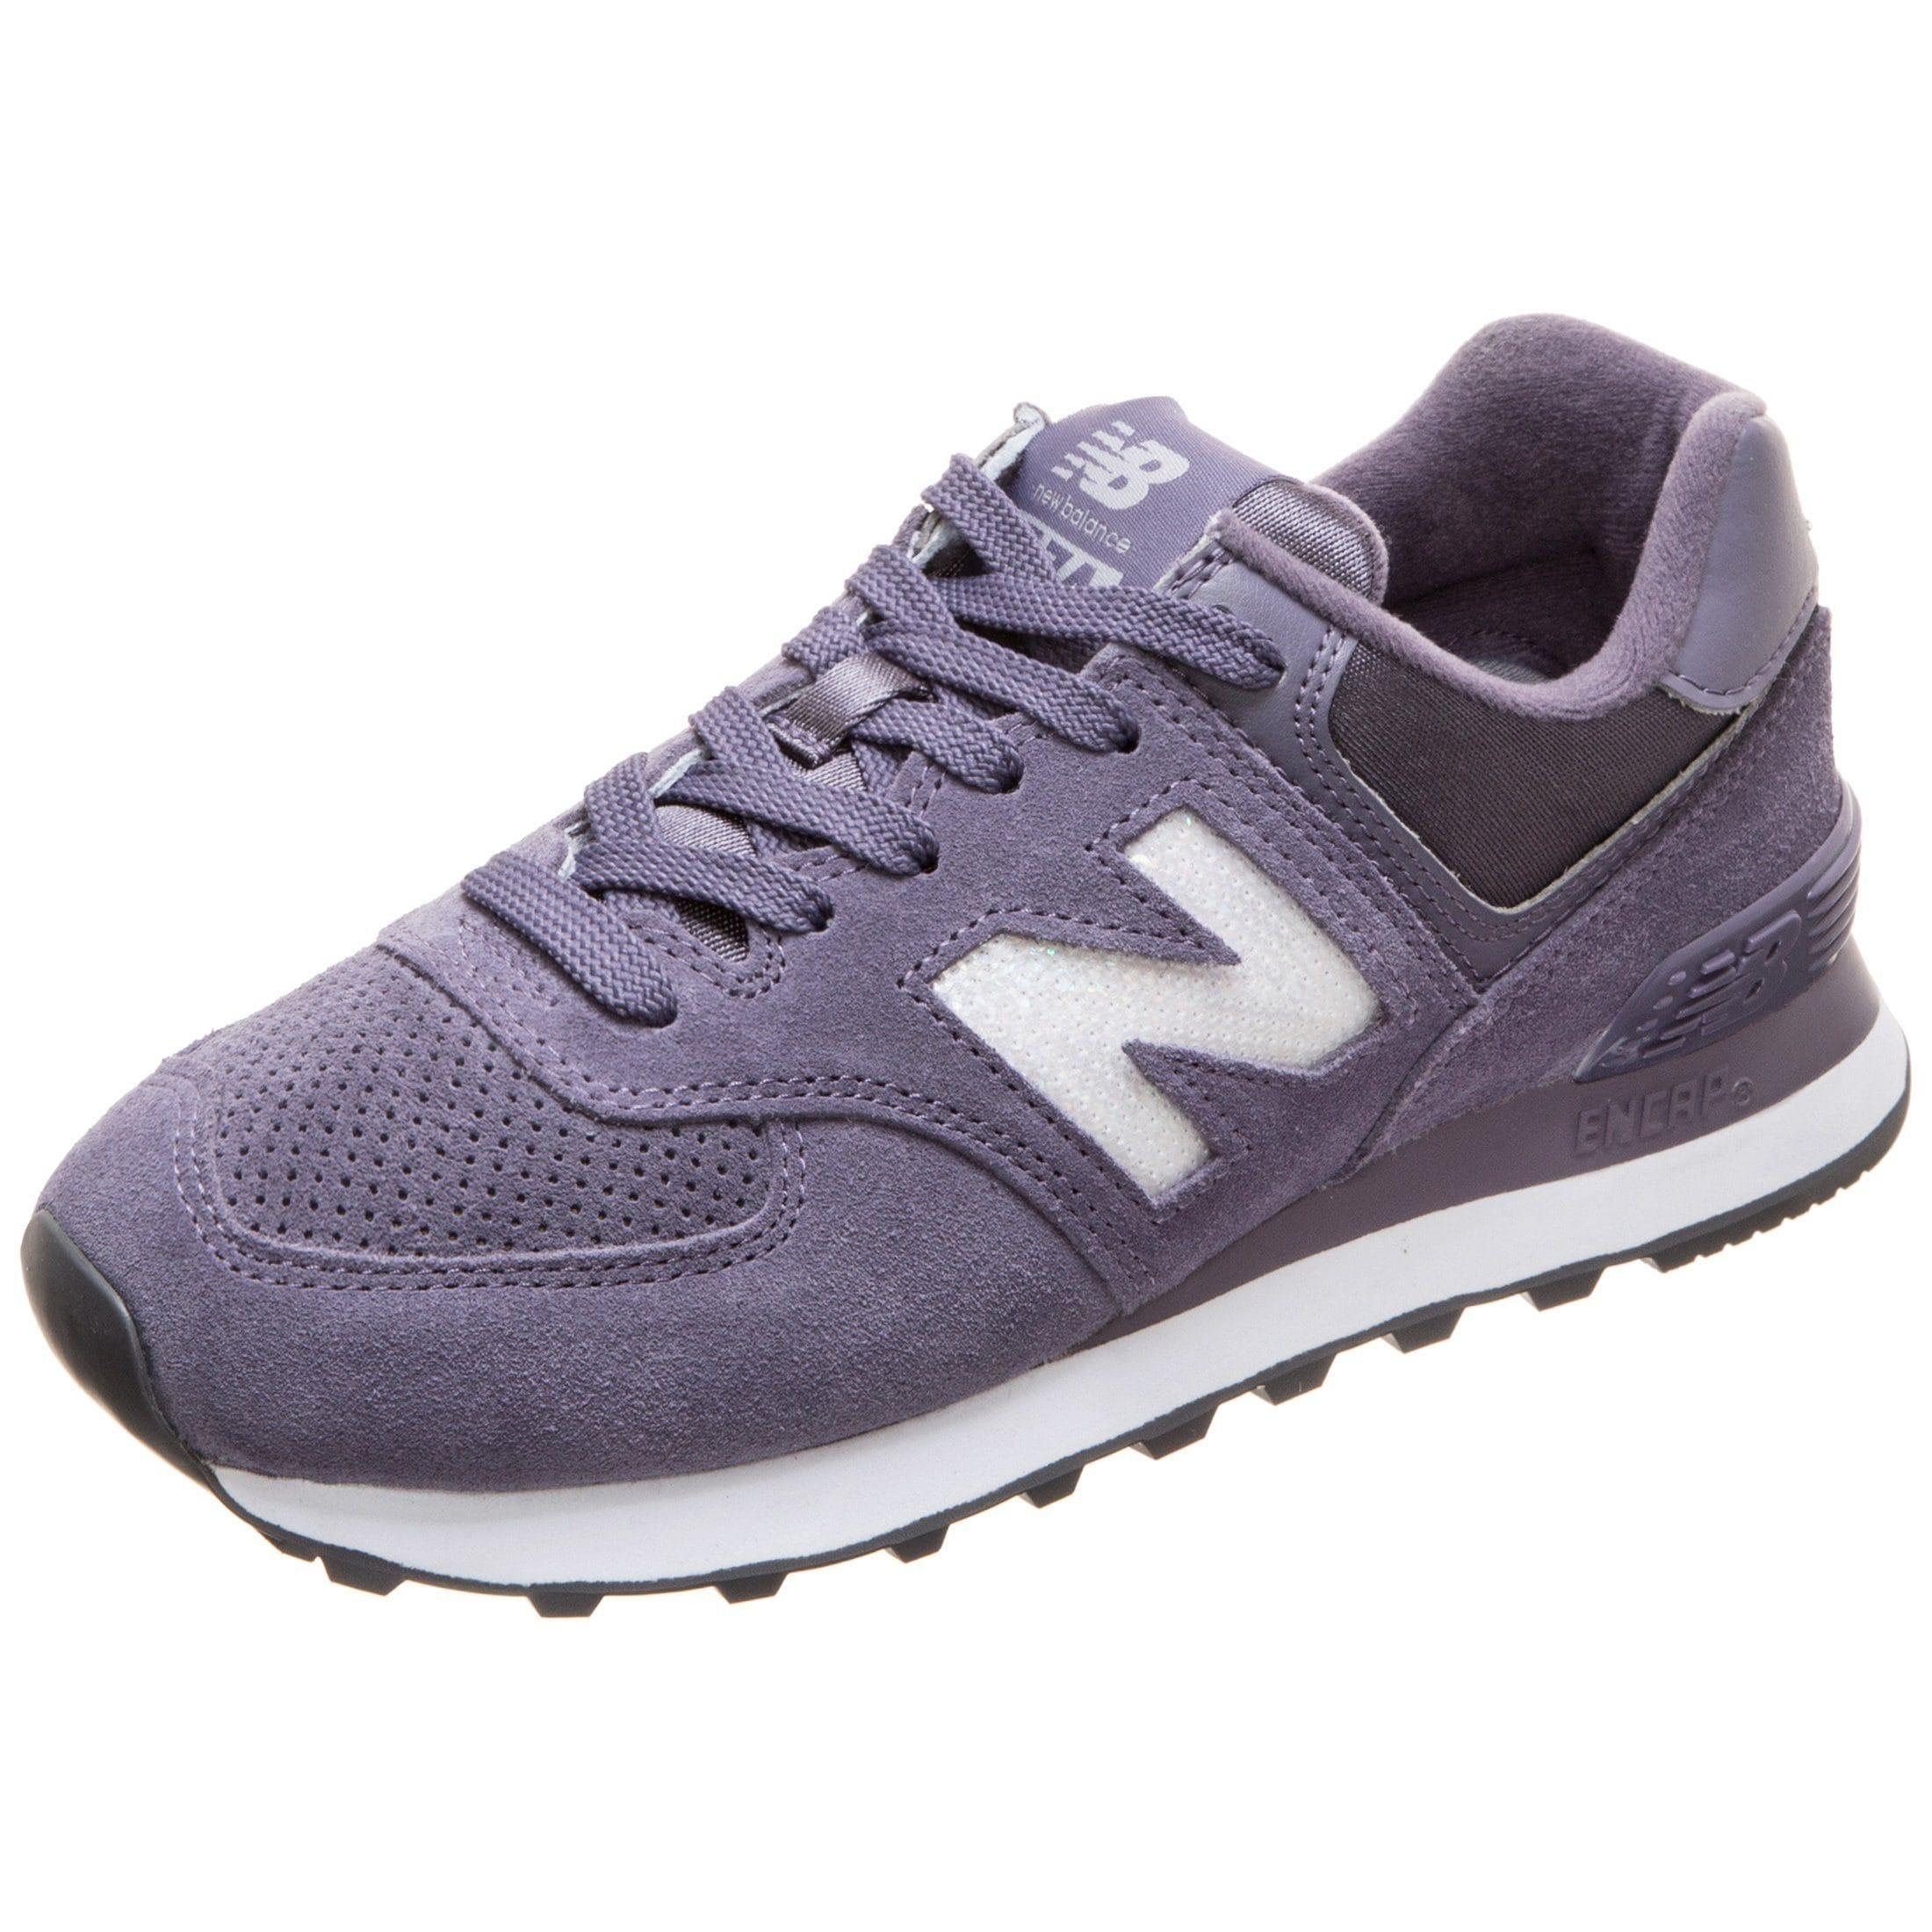 promo code d2dd3 b0d0c Damen New Balance Sneaker Wl574-fhb-b  00191902730635